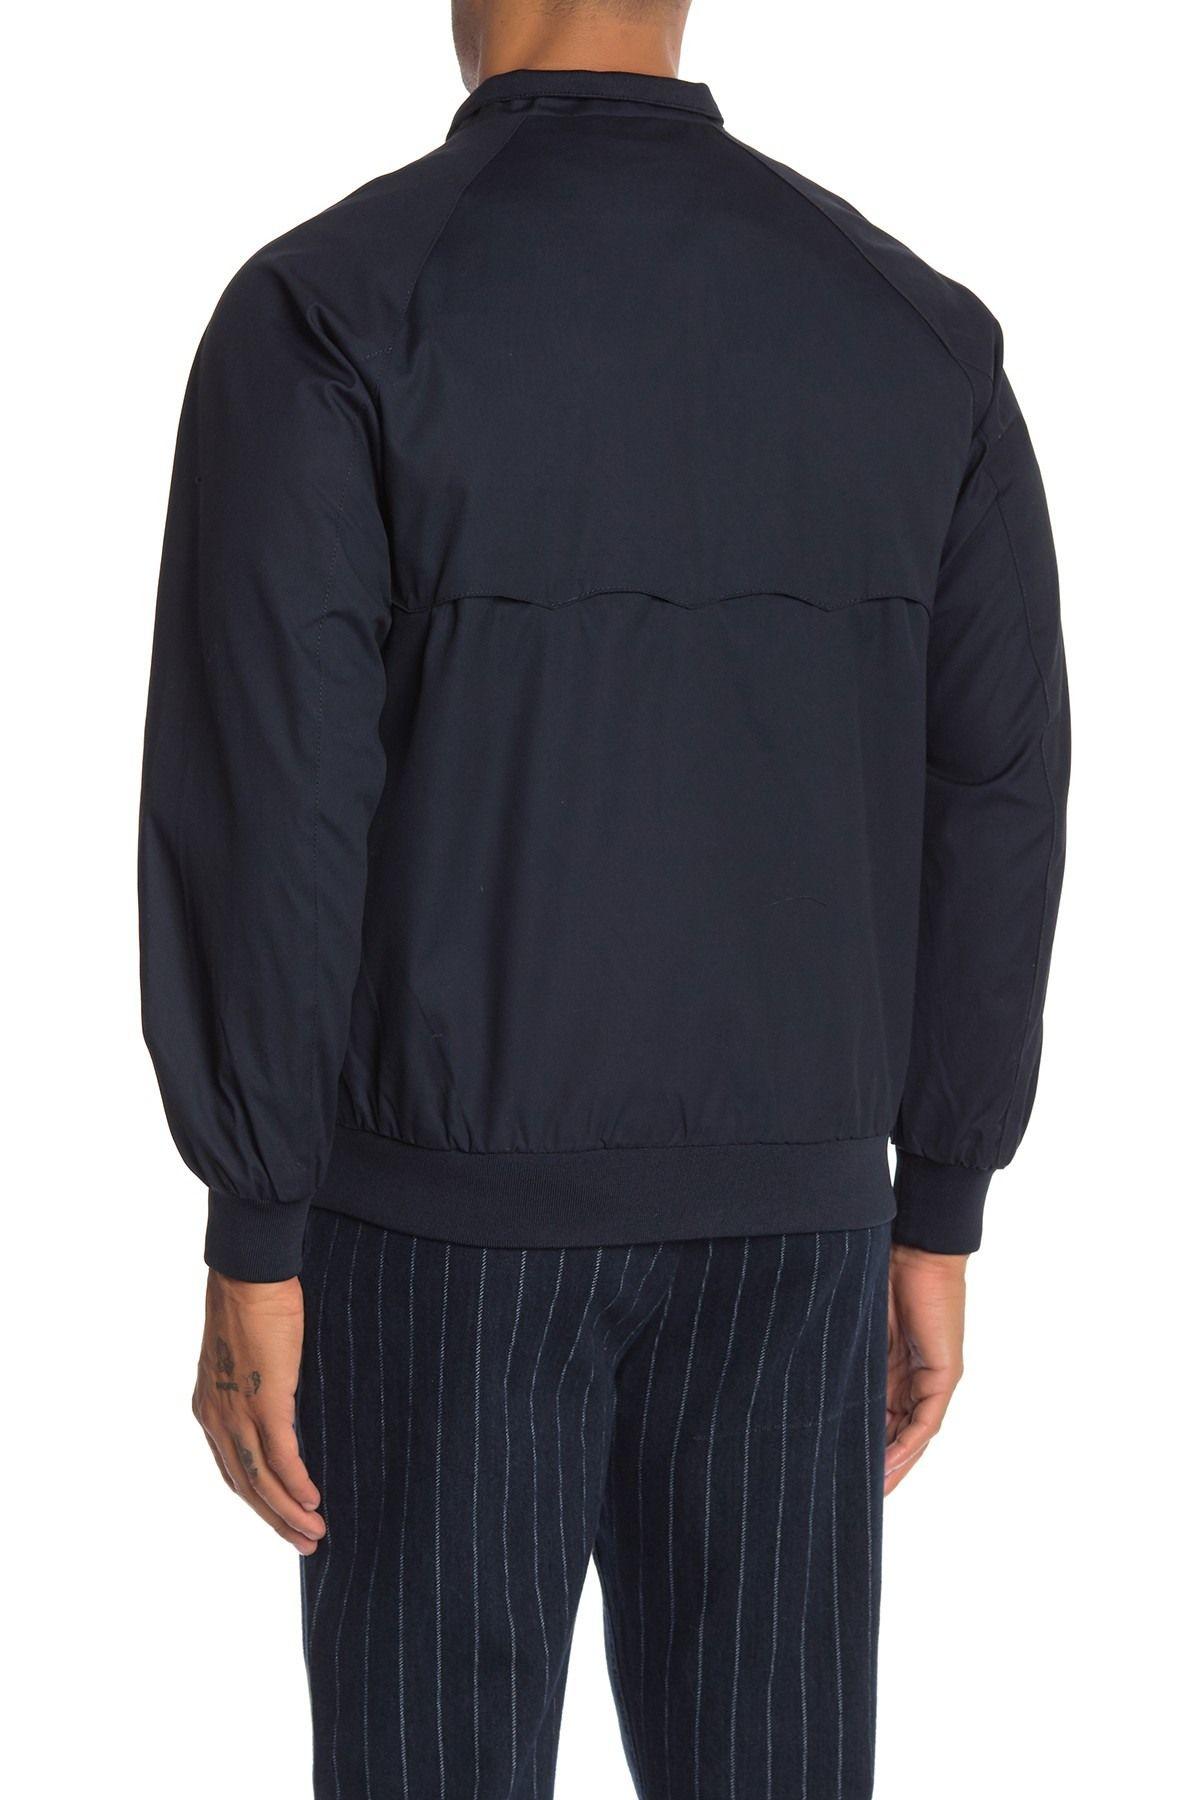 Https Www Nordstromrack Com Shop Product 2647004 Knowledge Cotton Apparel Catalina Jacket Color 1001 20total Apparel Jackets Cotton [ 1800 x 1200 Pixel ]